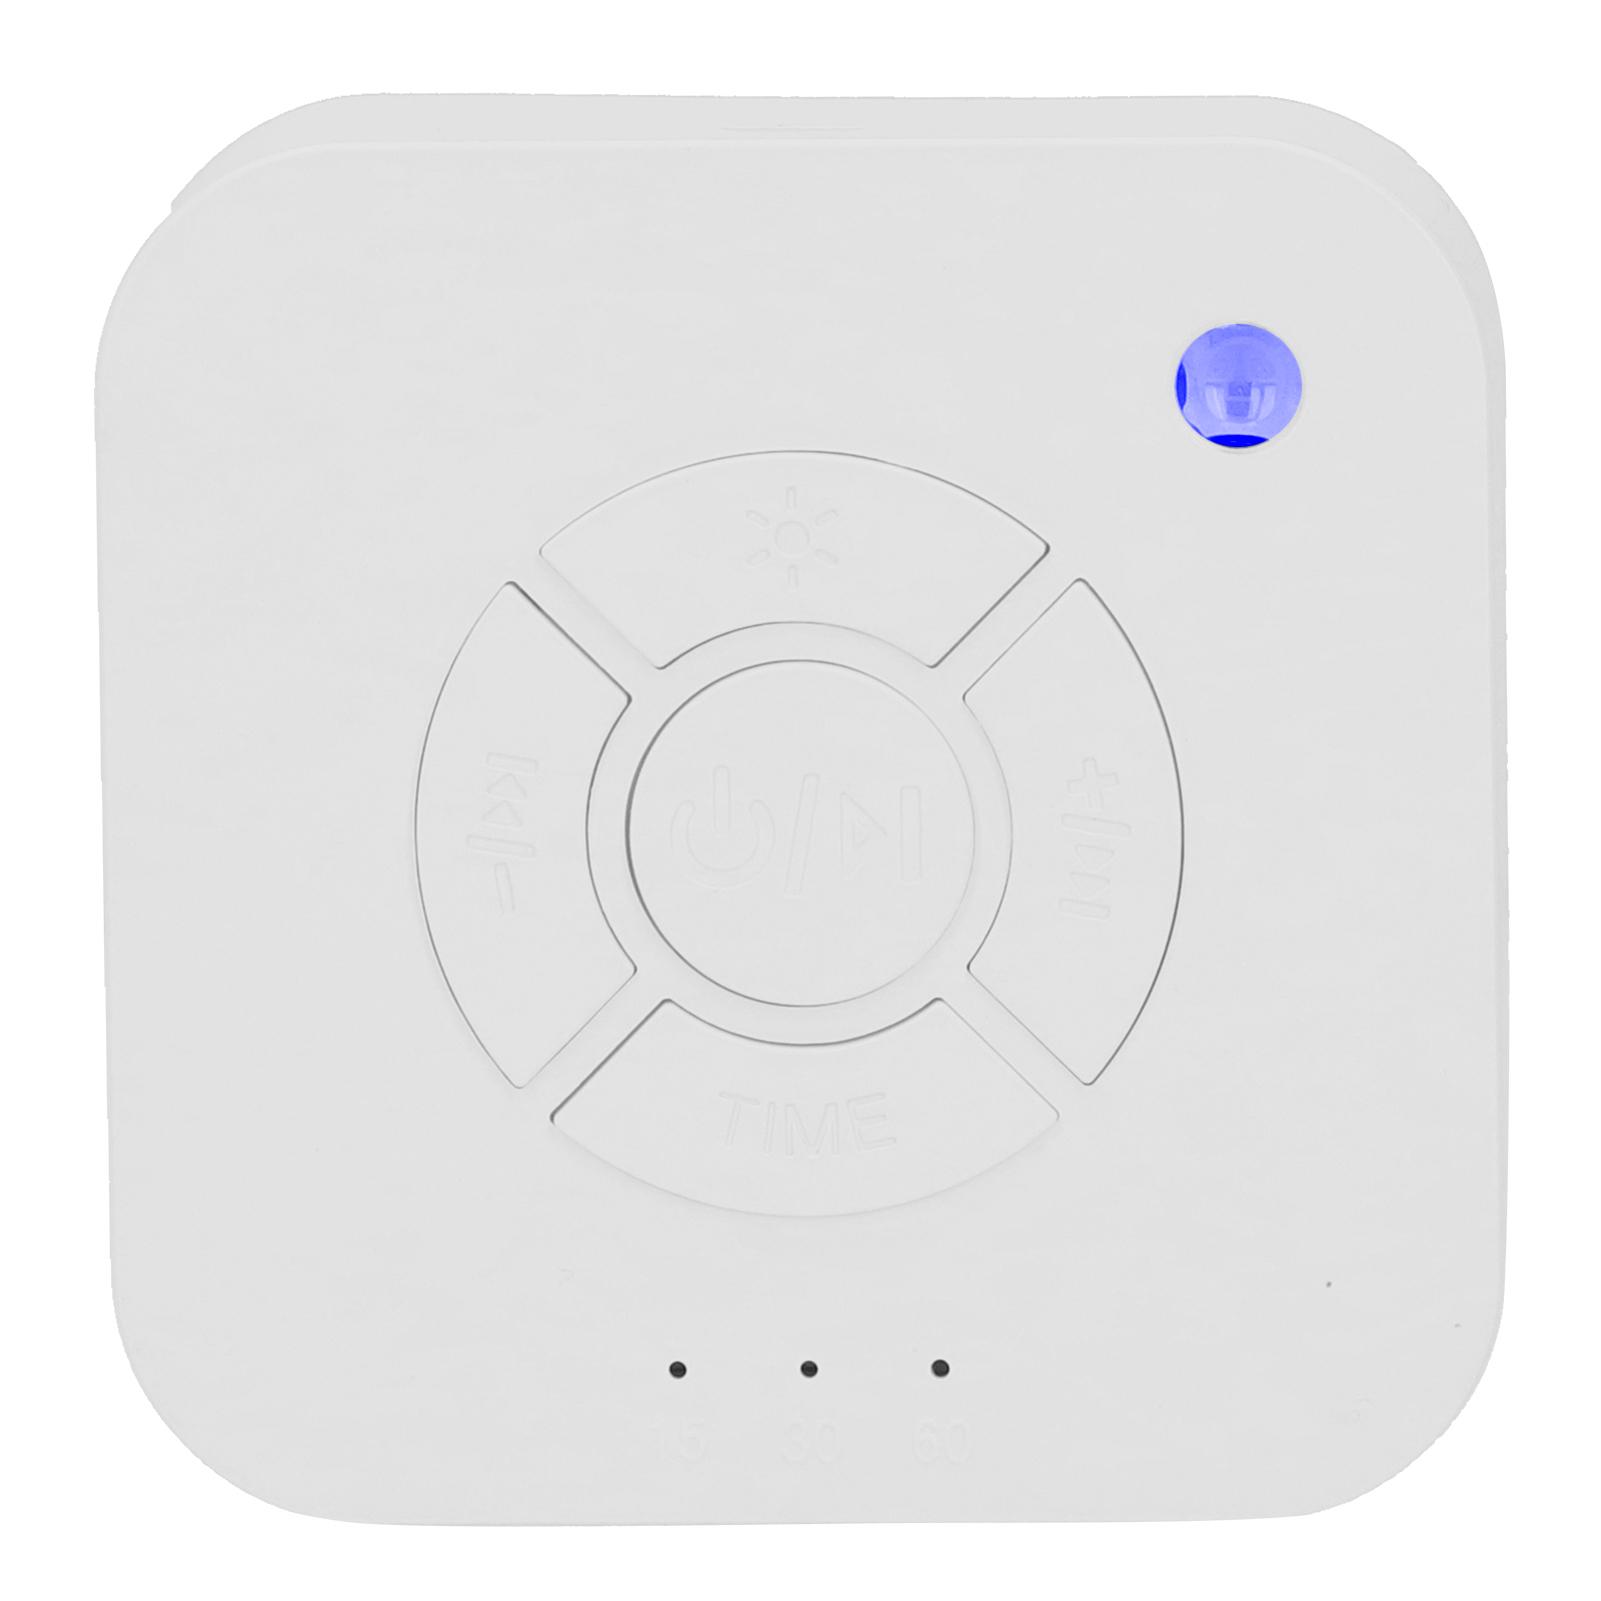 Indexbild 11 - Sleep Machine White‑Noise Aid Music Light Device Infant Breathing Therapy Sound